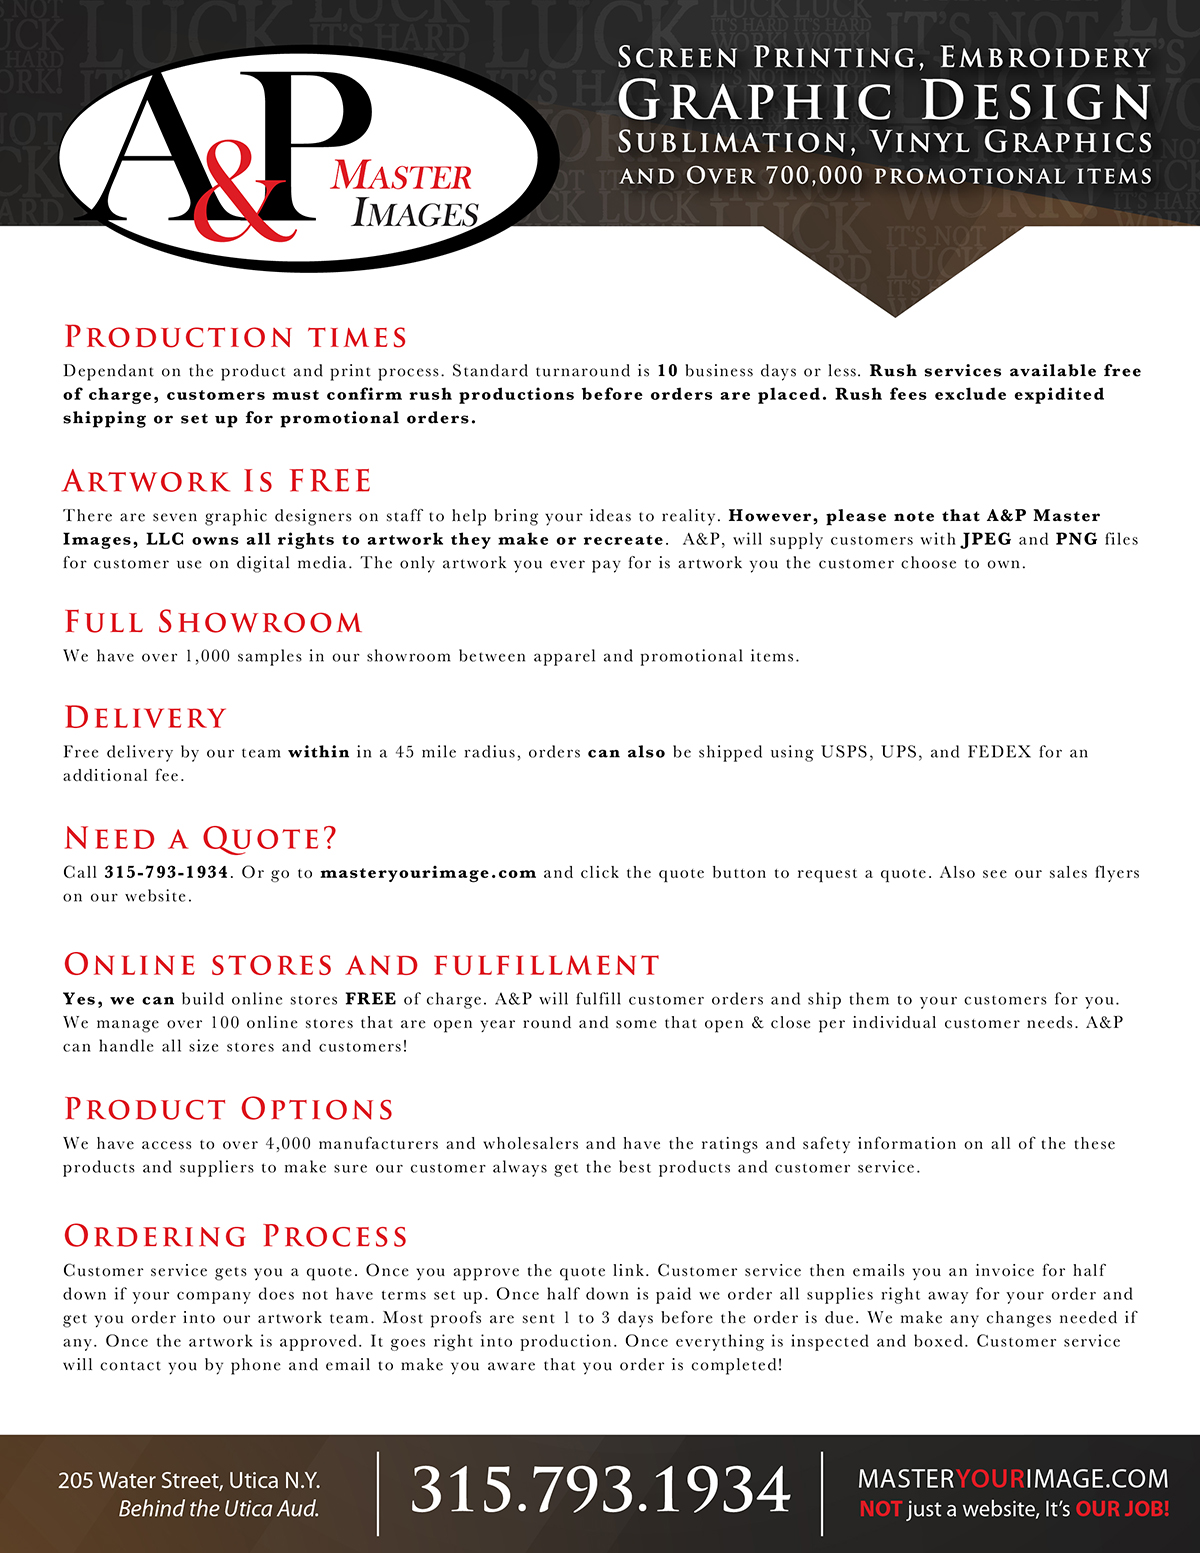 Sales Flyers - Information Sheet